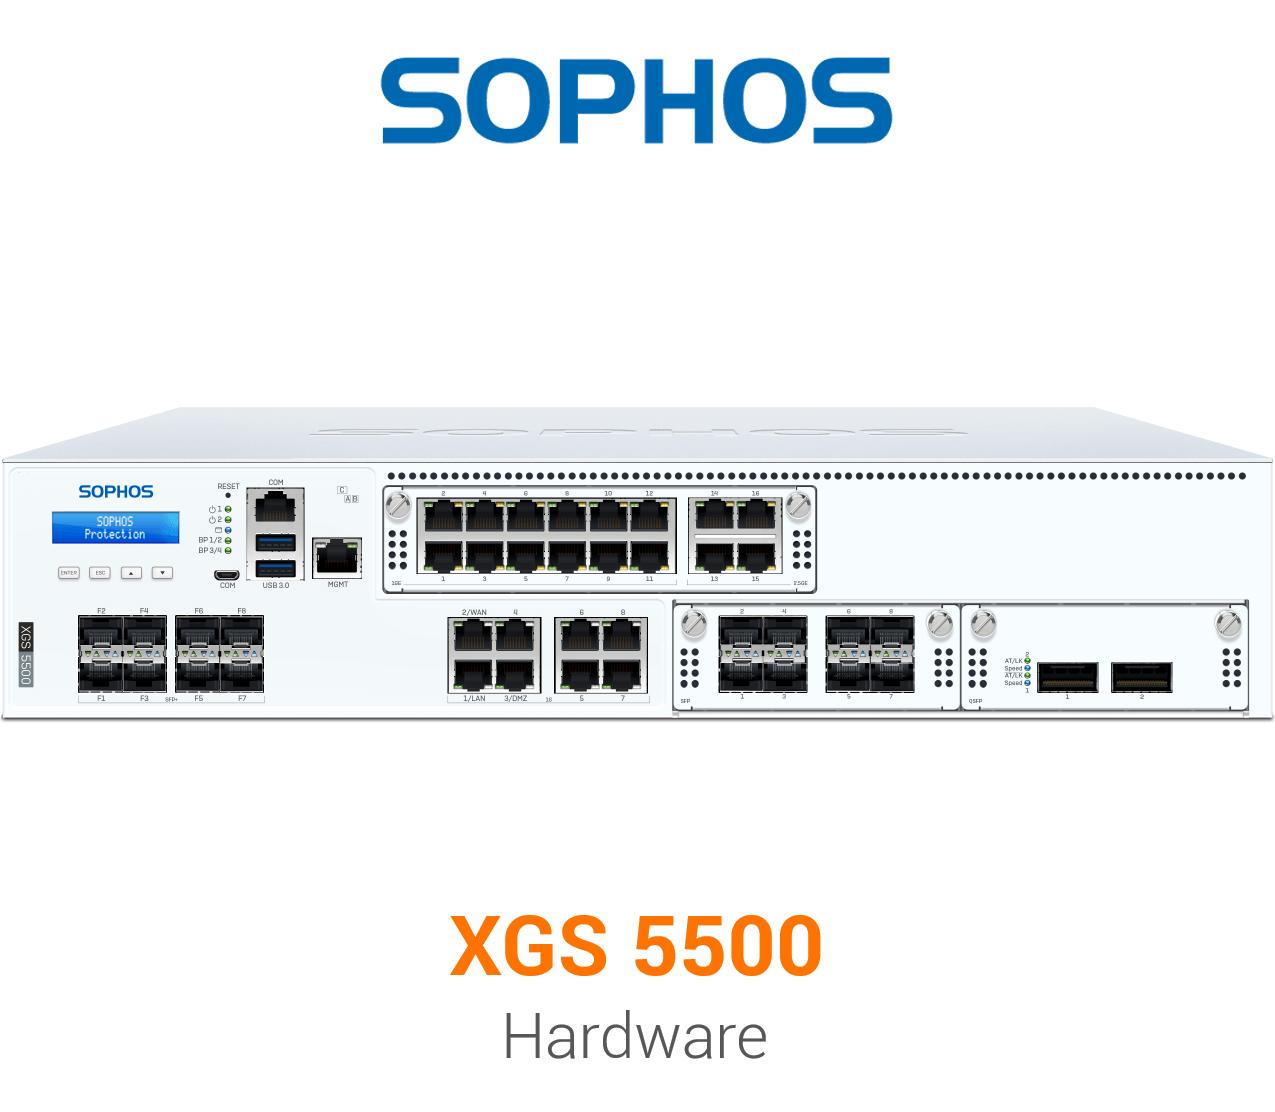 Sophos XGS 5500 Security Appliance